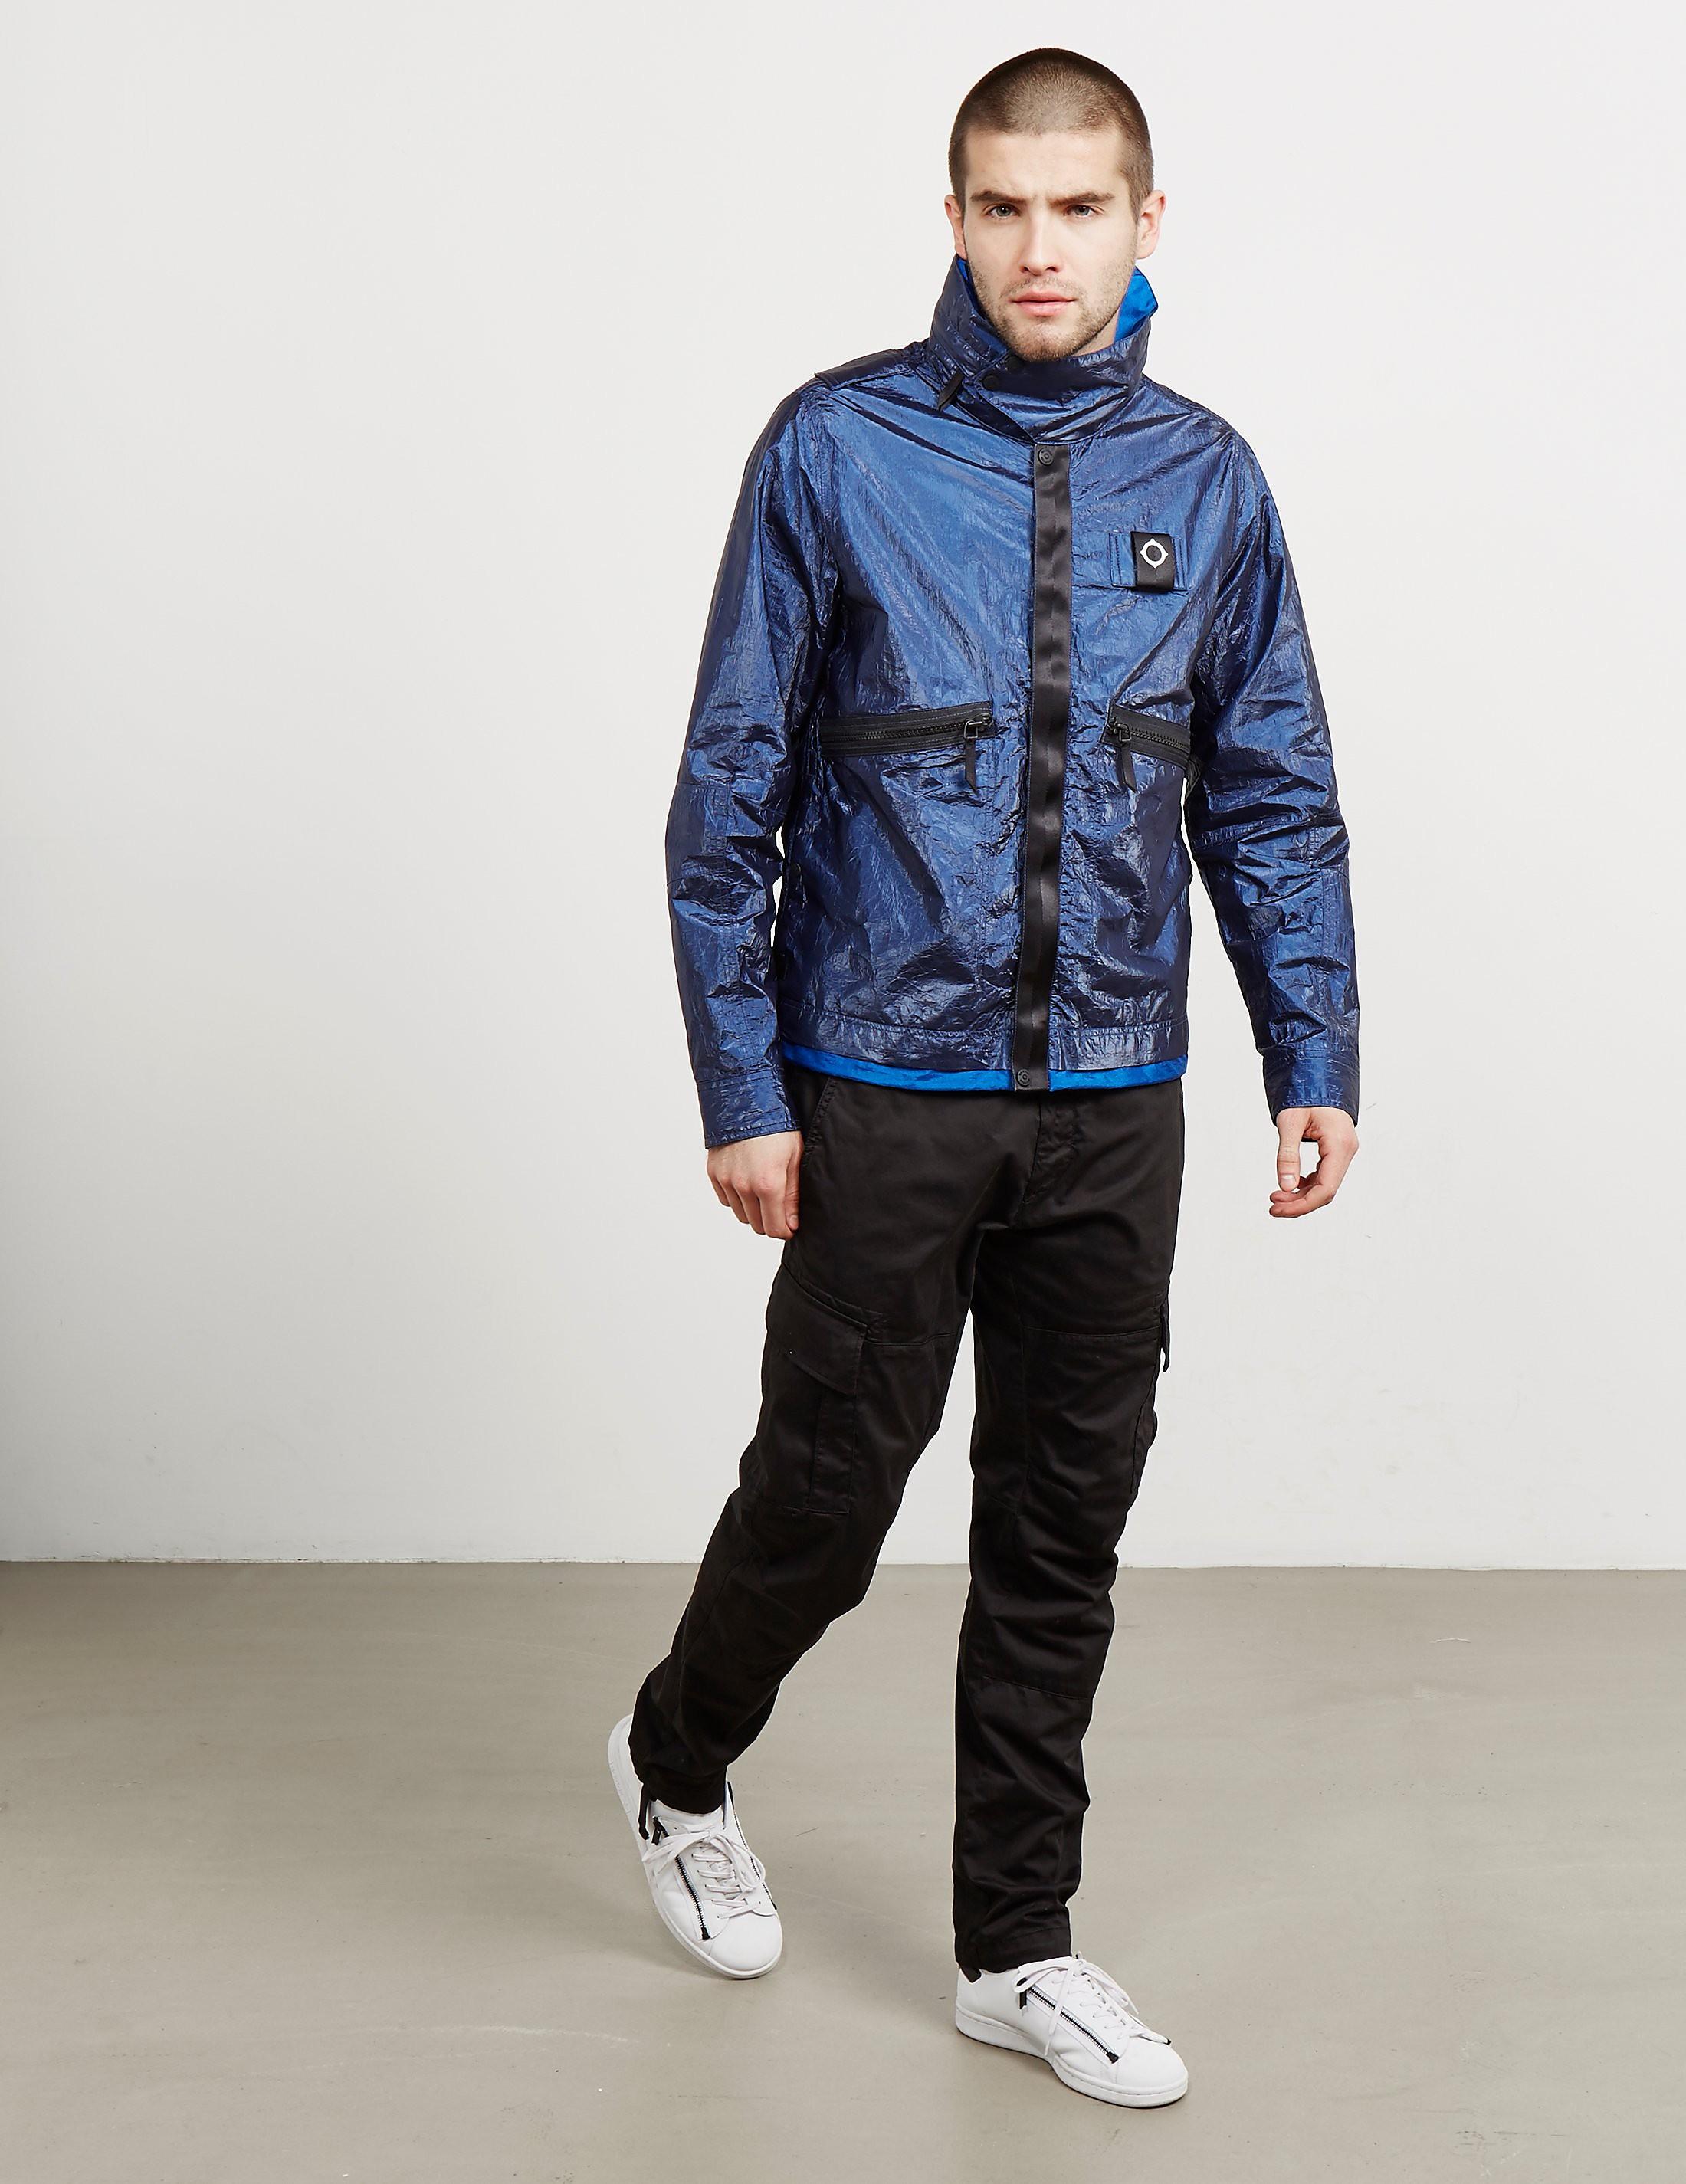 MA STRUM Atlas Flash Jacket